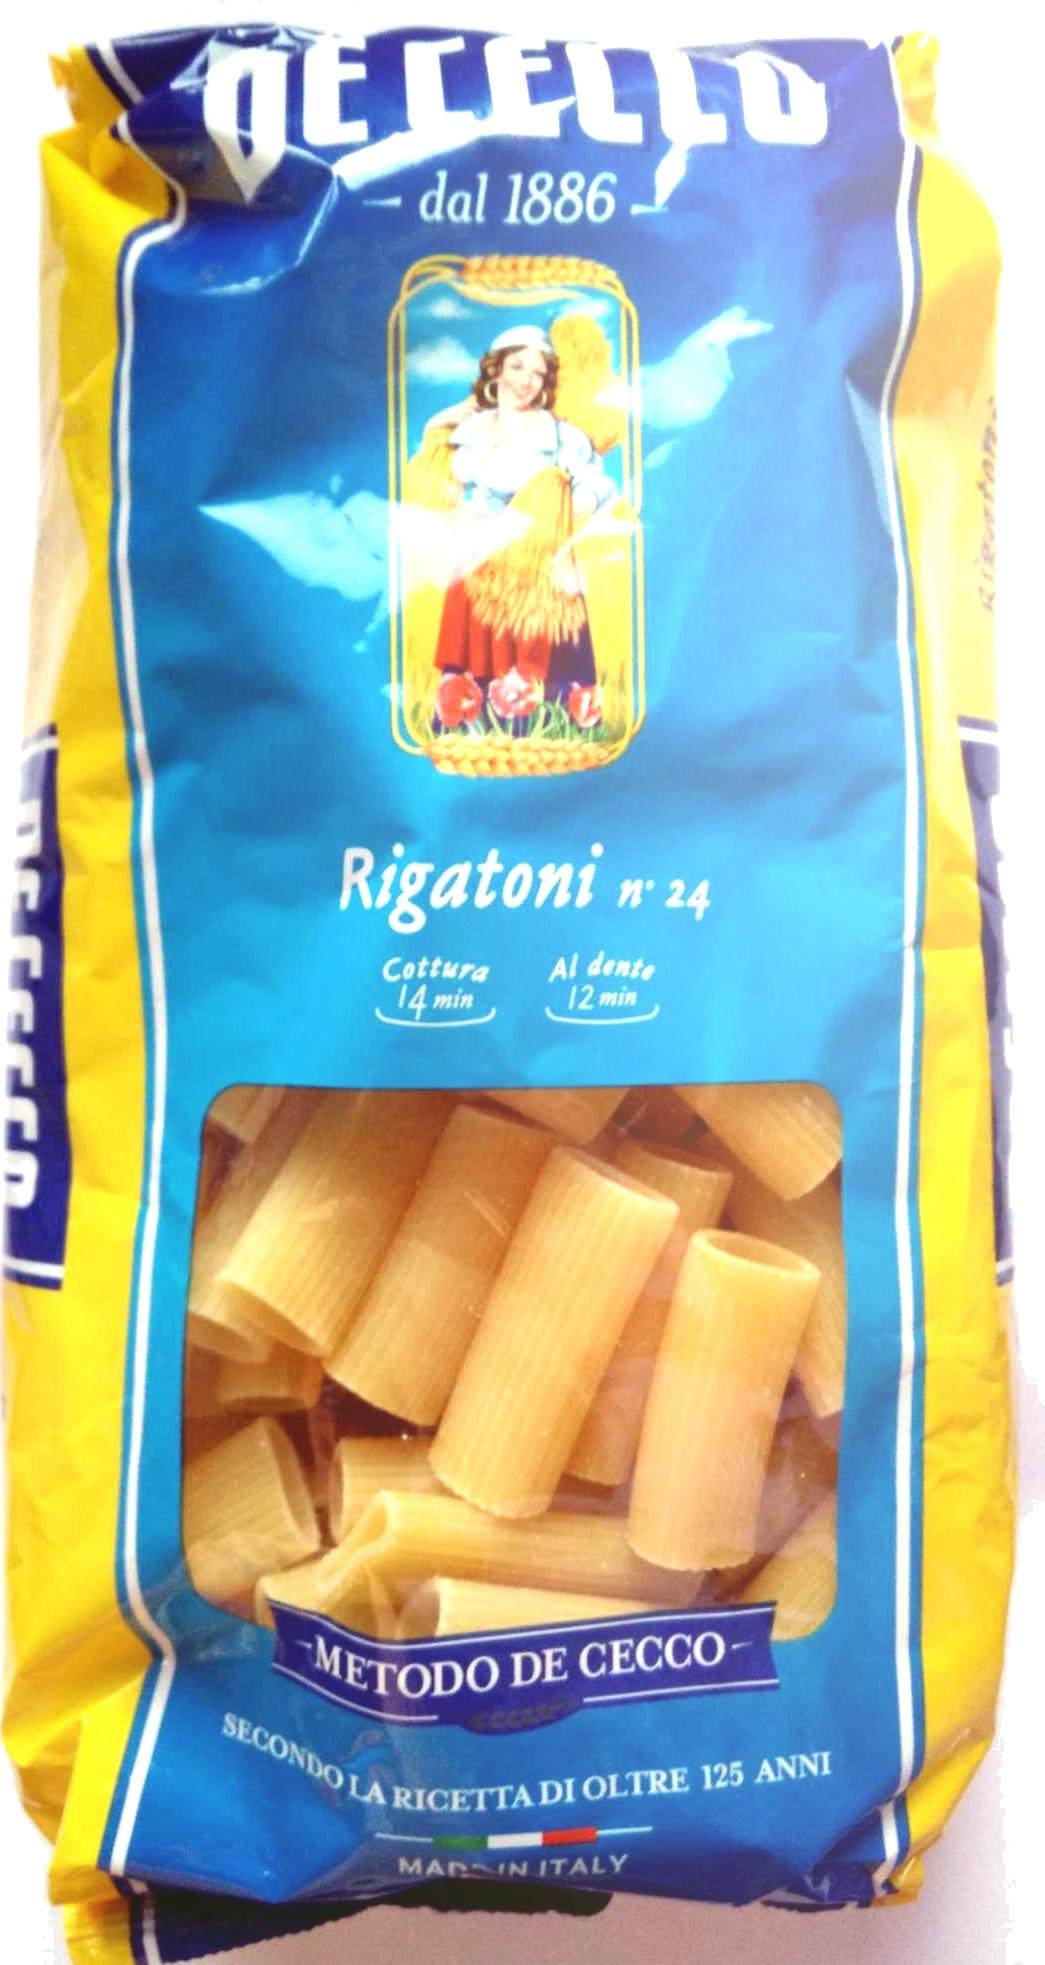 Rigatoni n°24 - Product